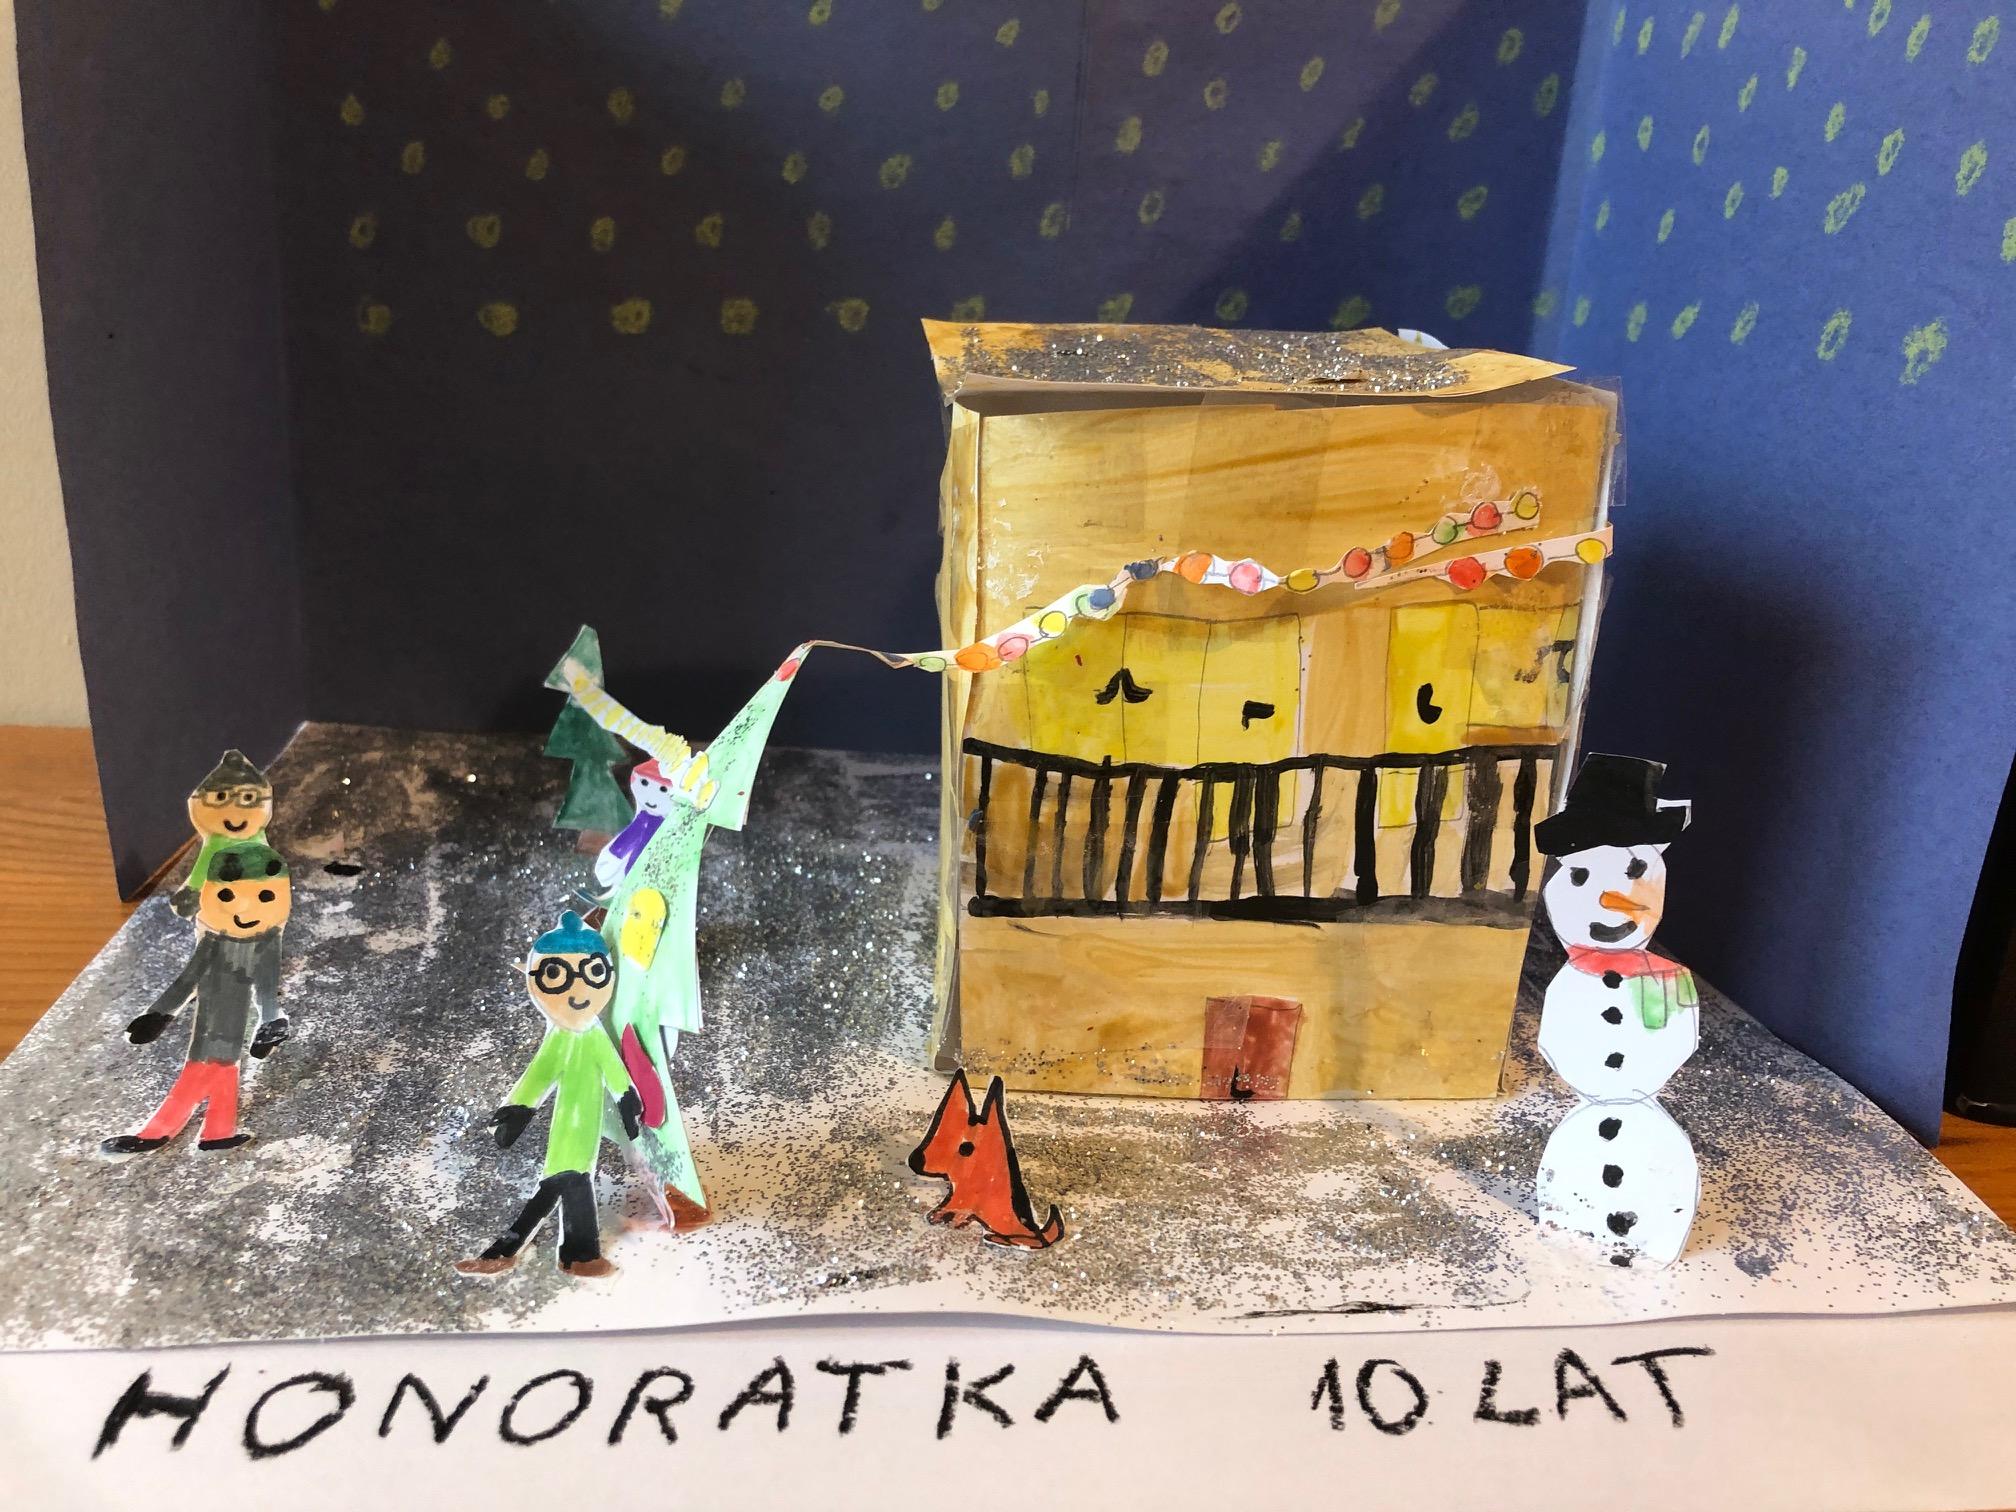 Honoratka